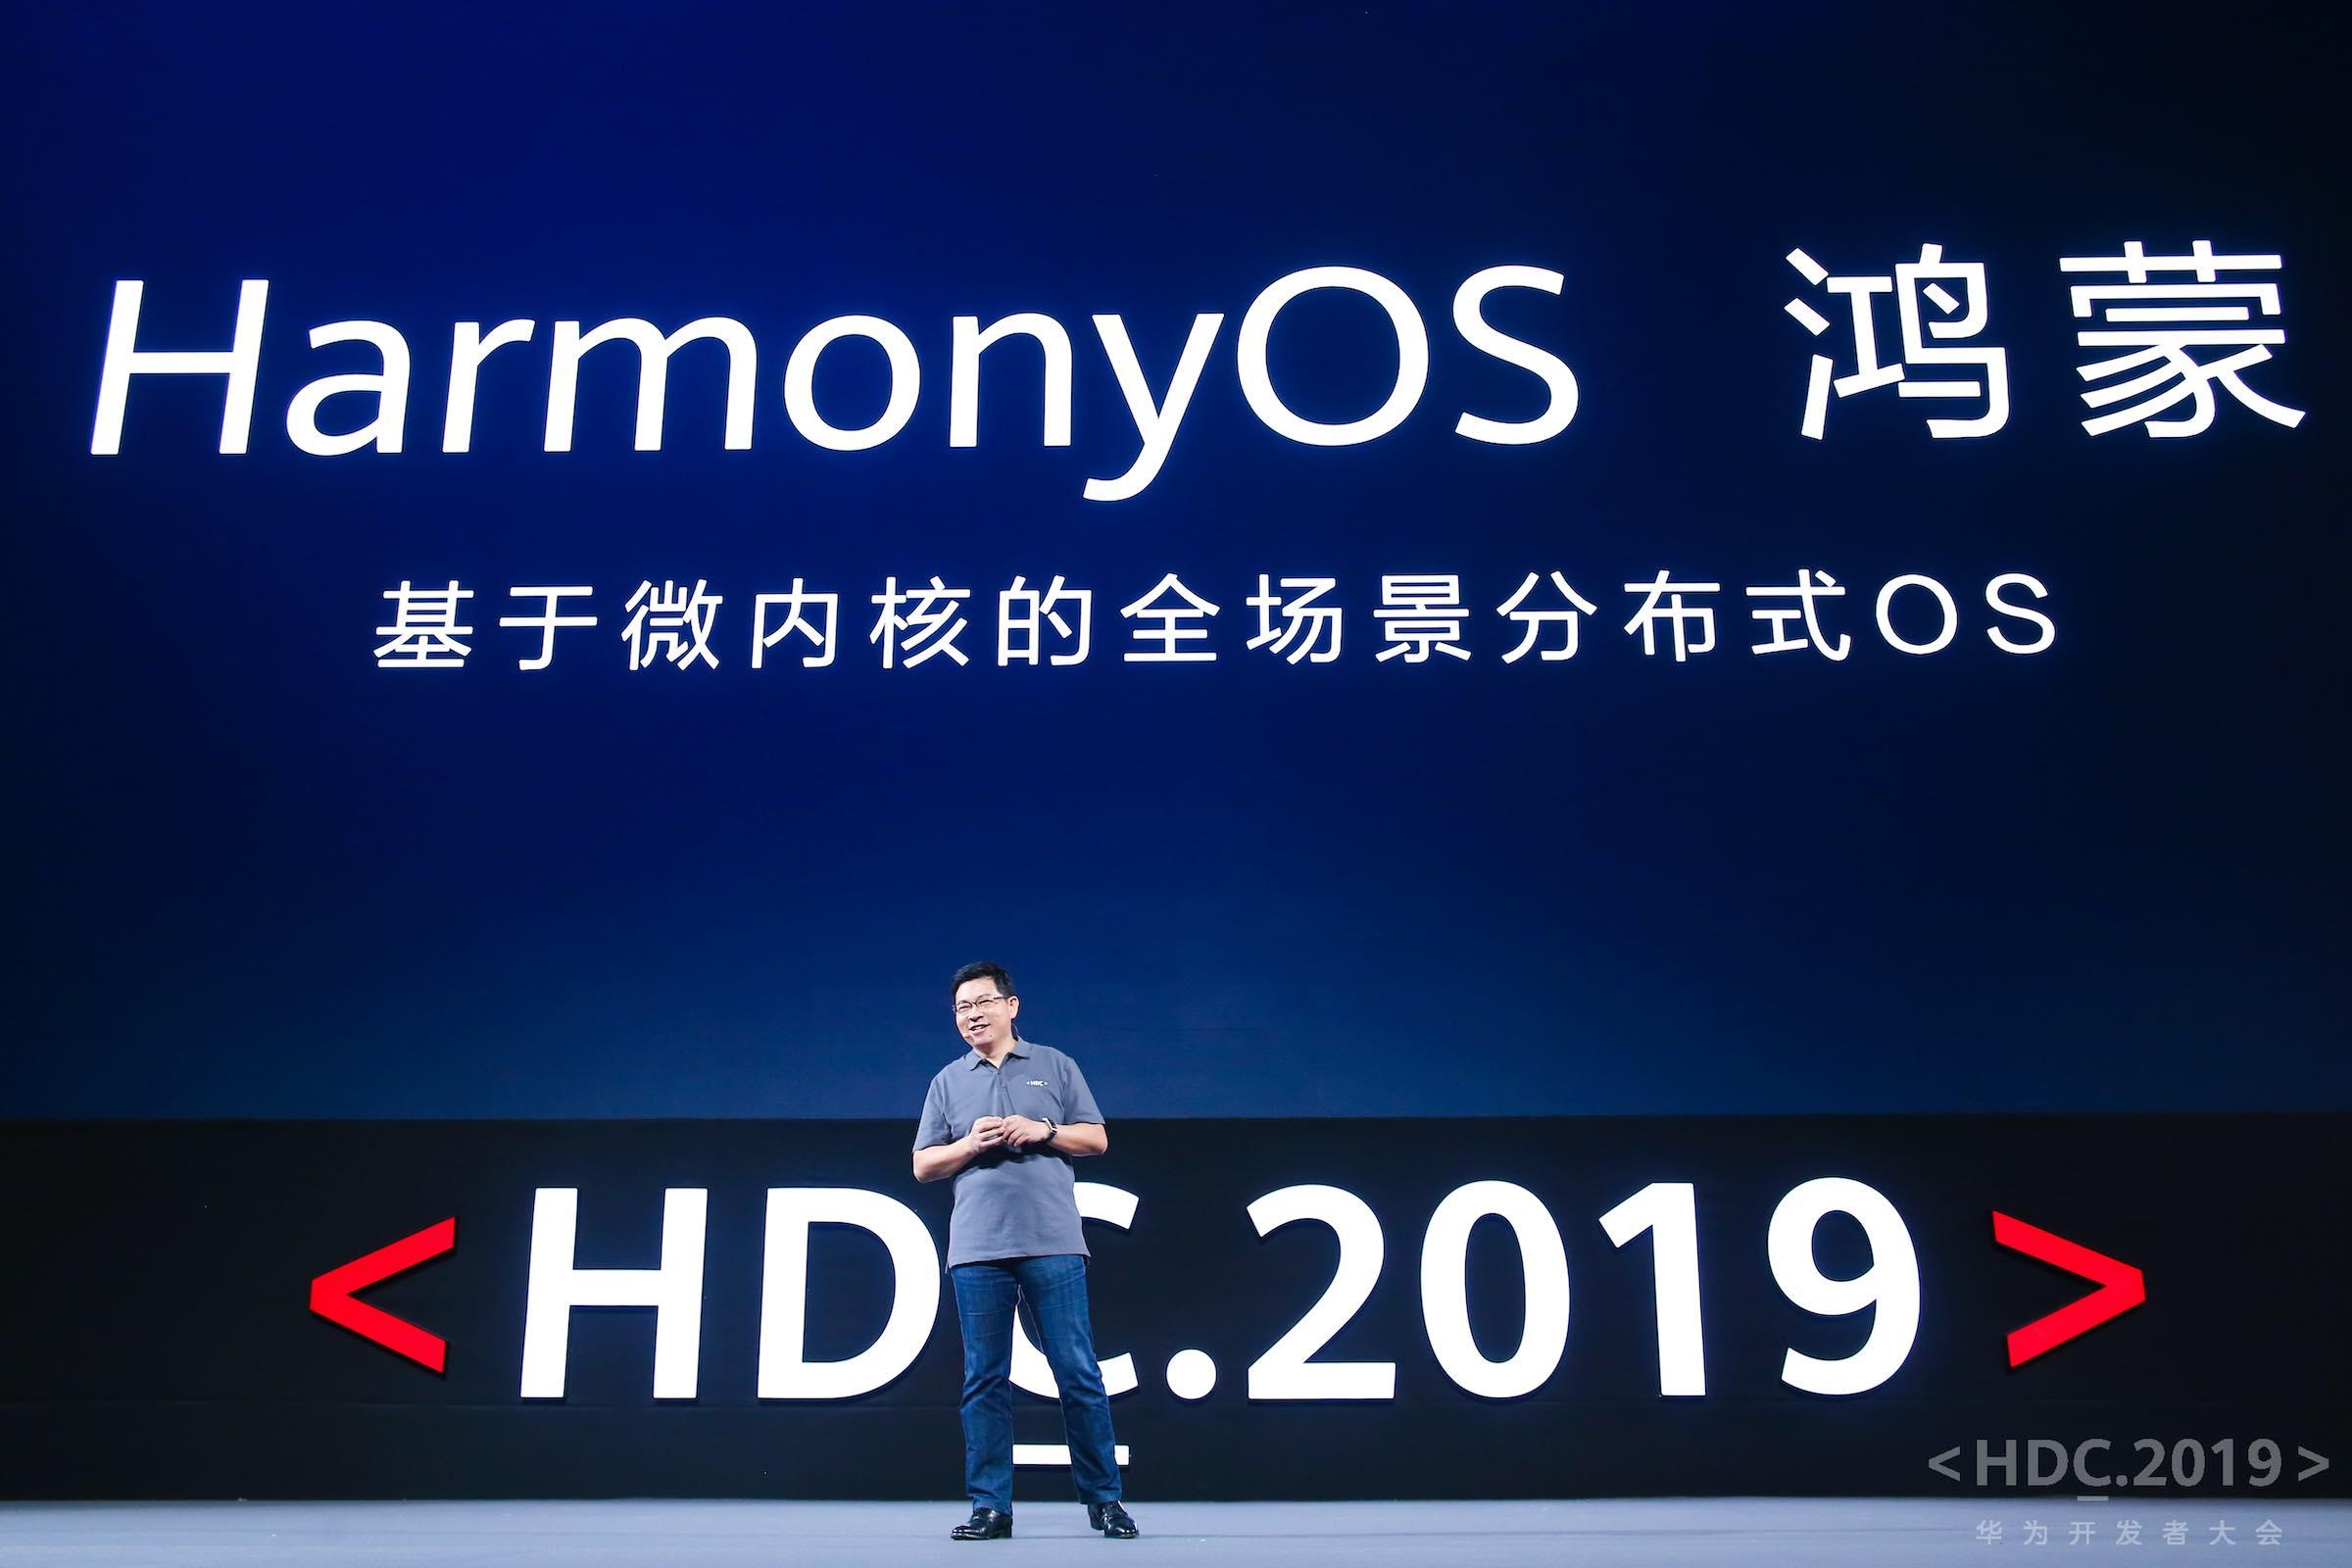 HarmonyOS: Huawei stellt neues Betriebssystem offiziell vor